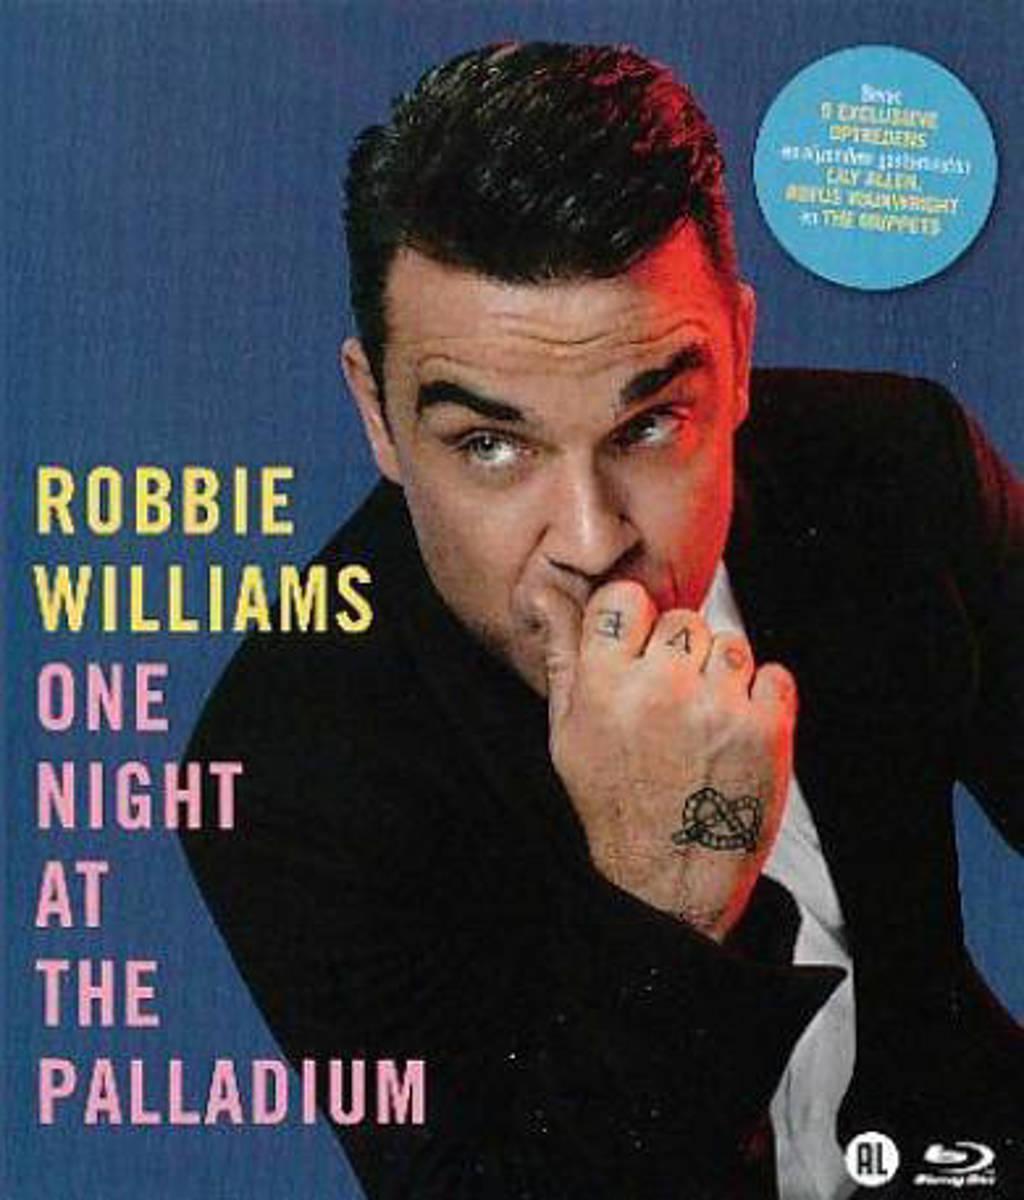 Robbie Williams - One night at the Palladium (Blu-ray)